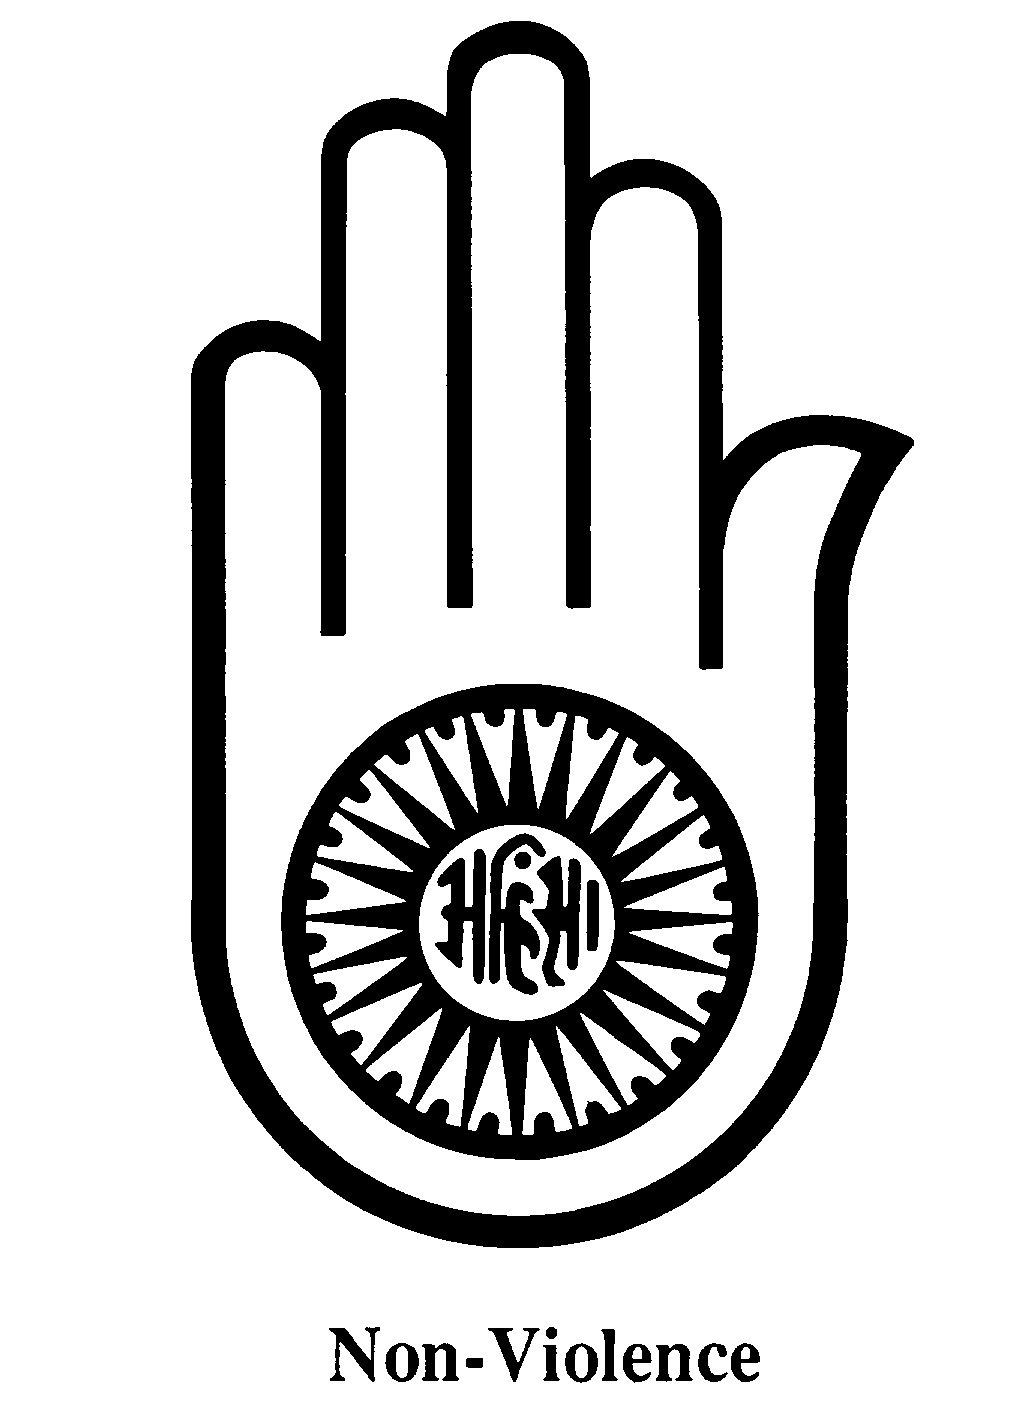 Mahavir Clipart-Clipartlook.com-1025